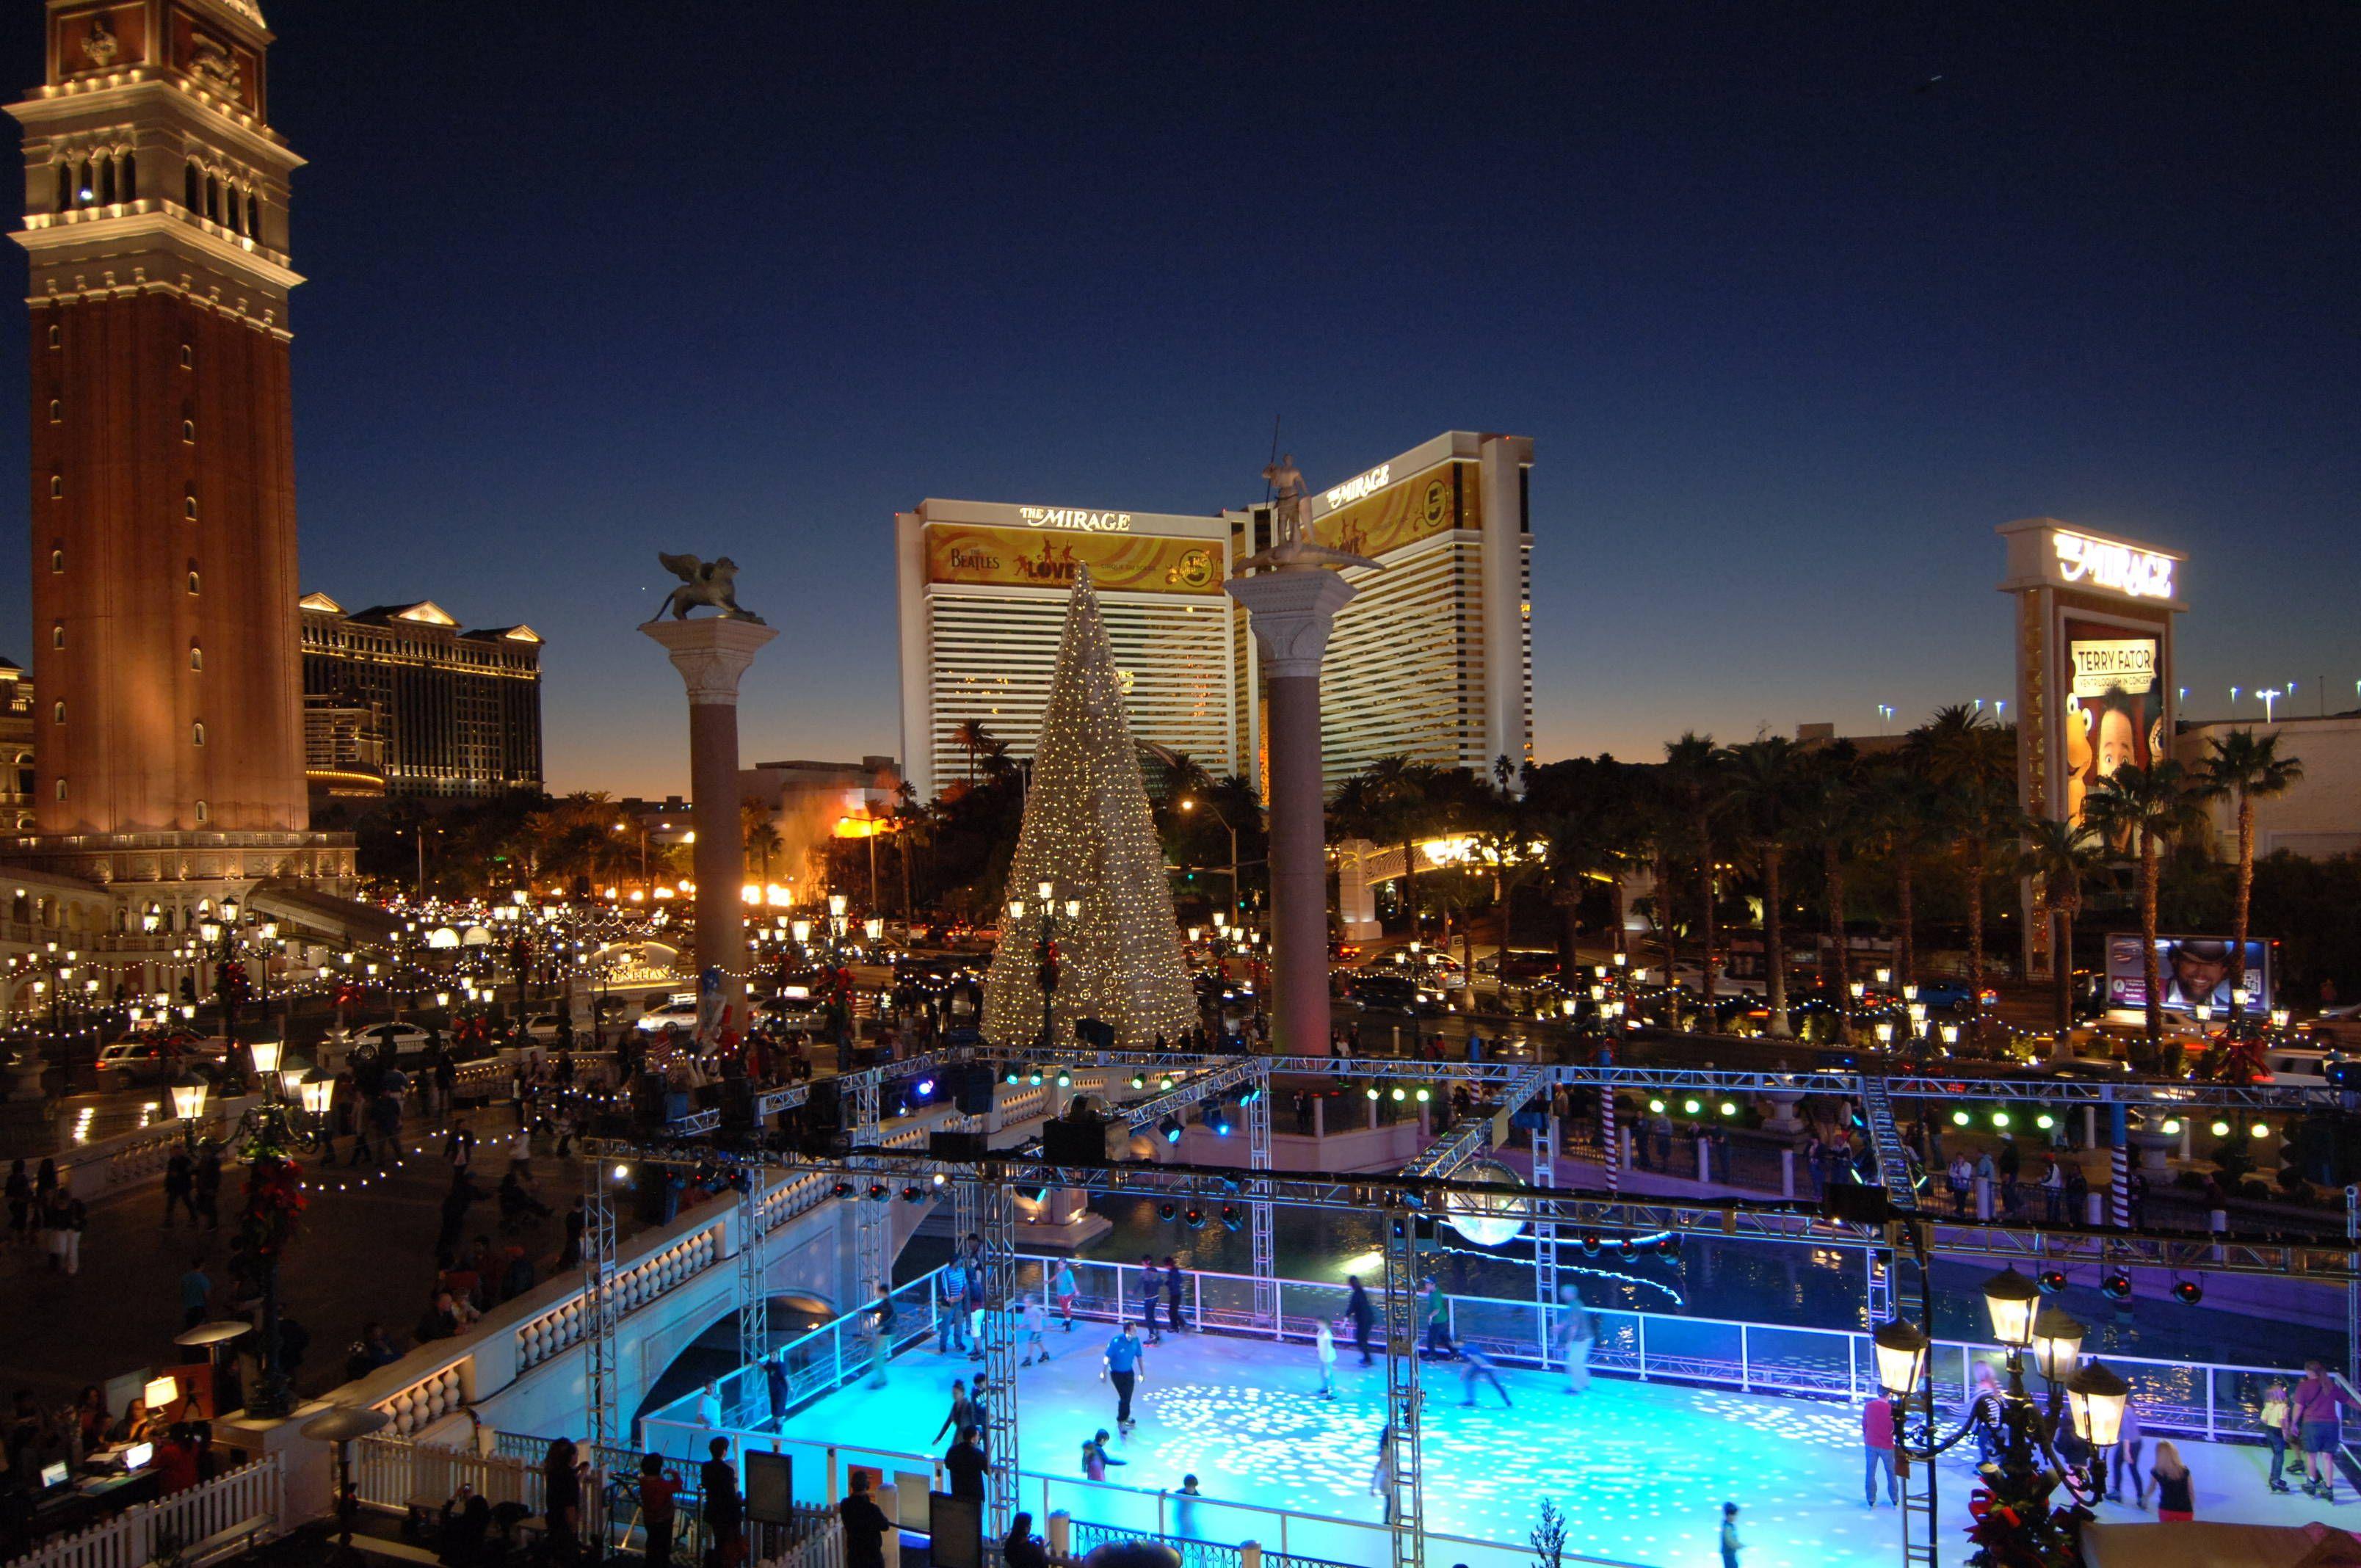 Looking forward to Vegas during the Christmas season. Dec ...